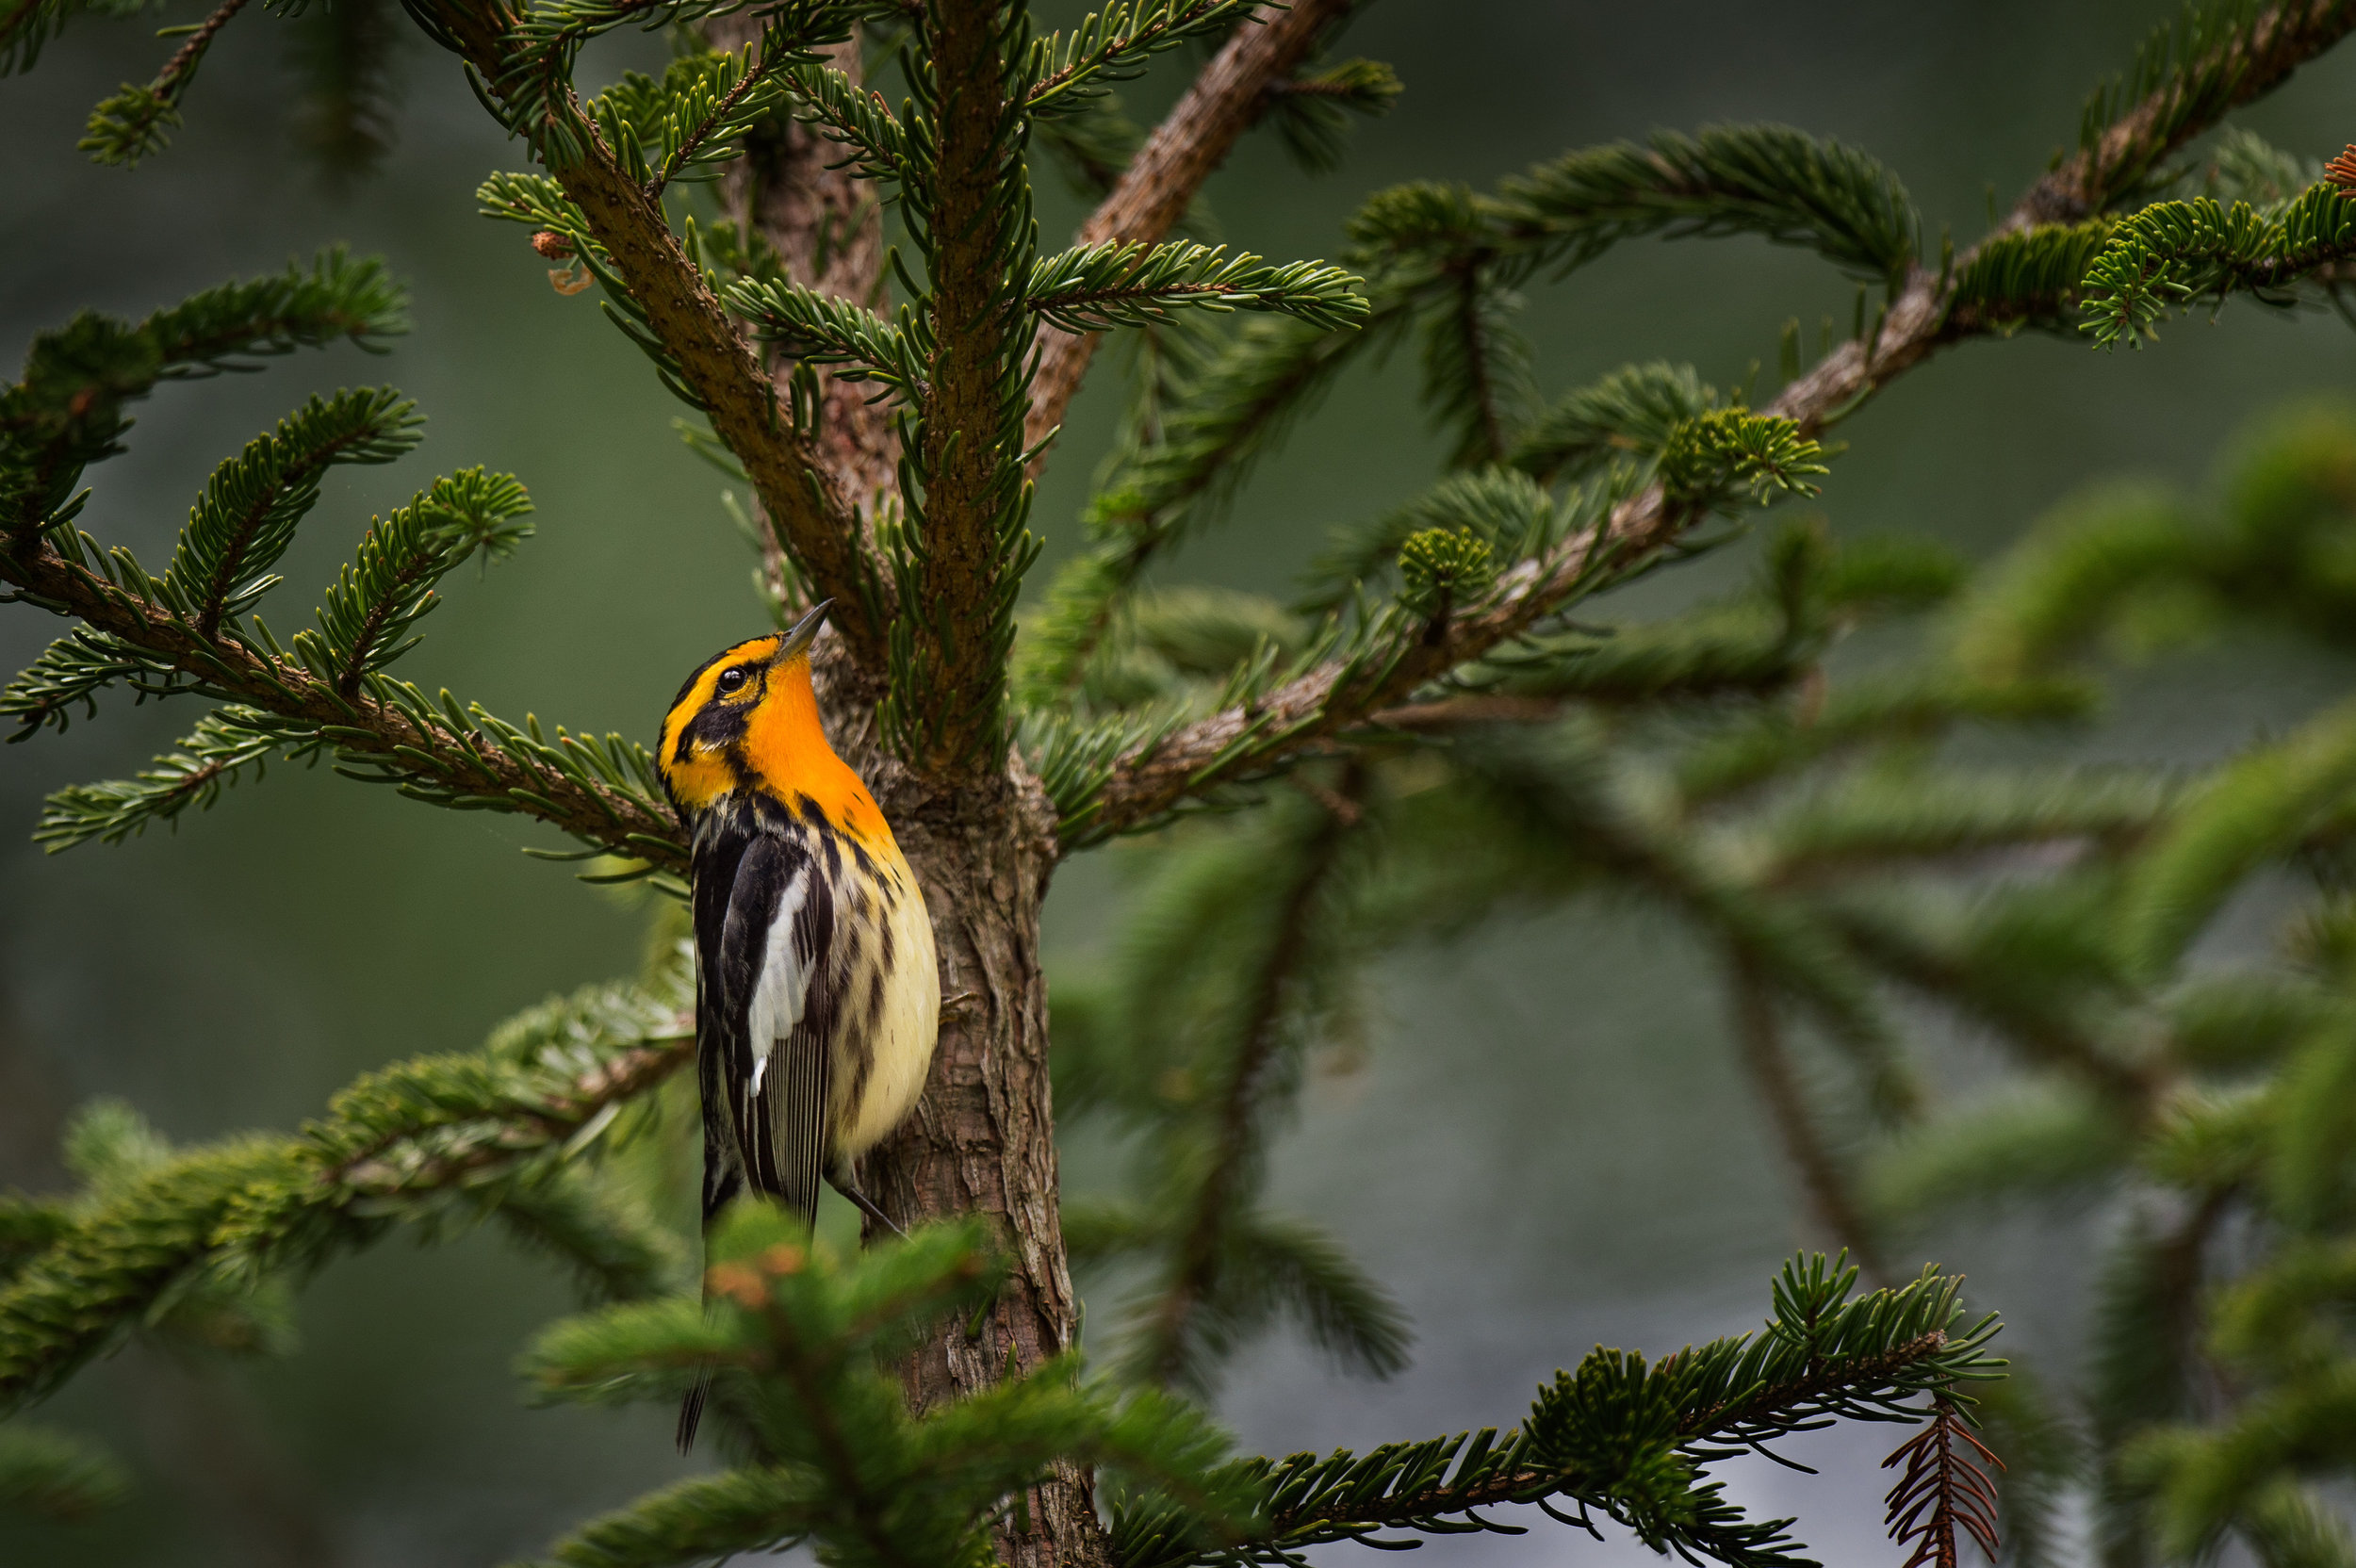 11_Blackburnian Warbler Feeding.jpg